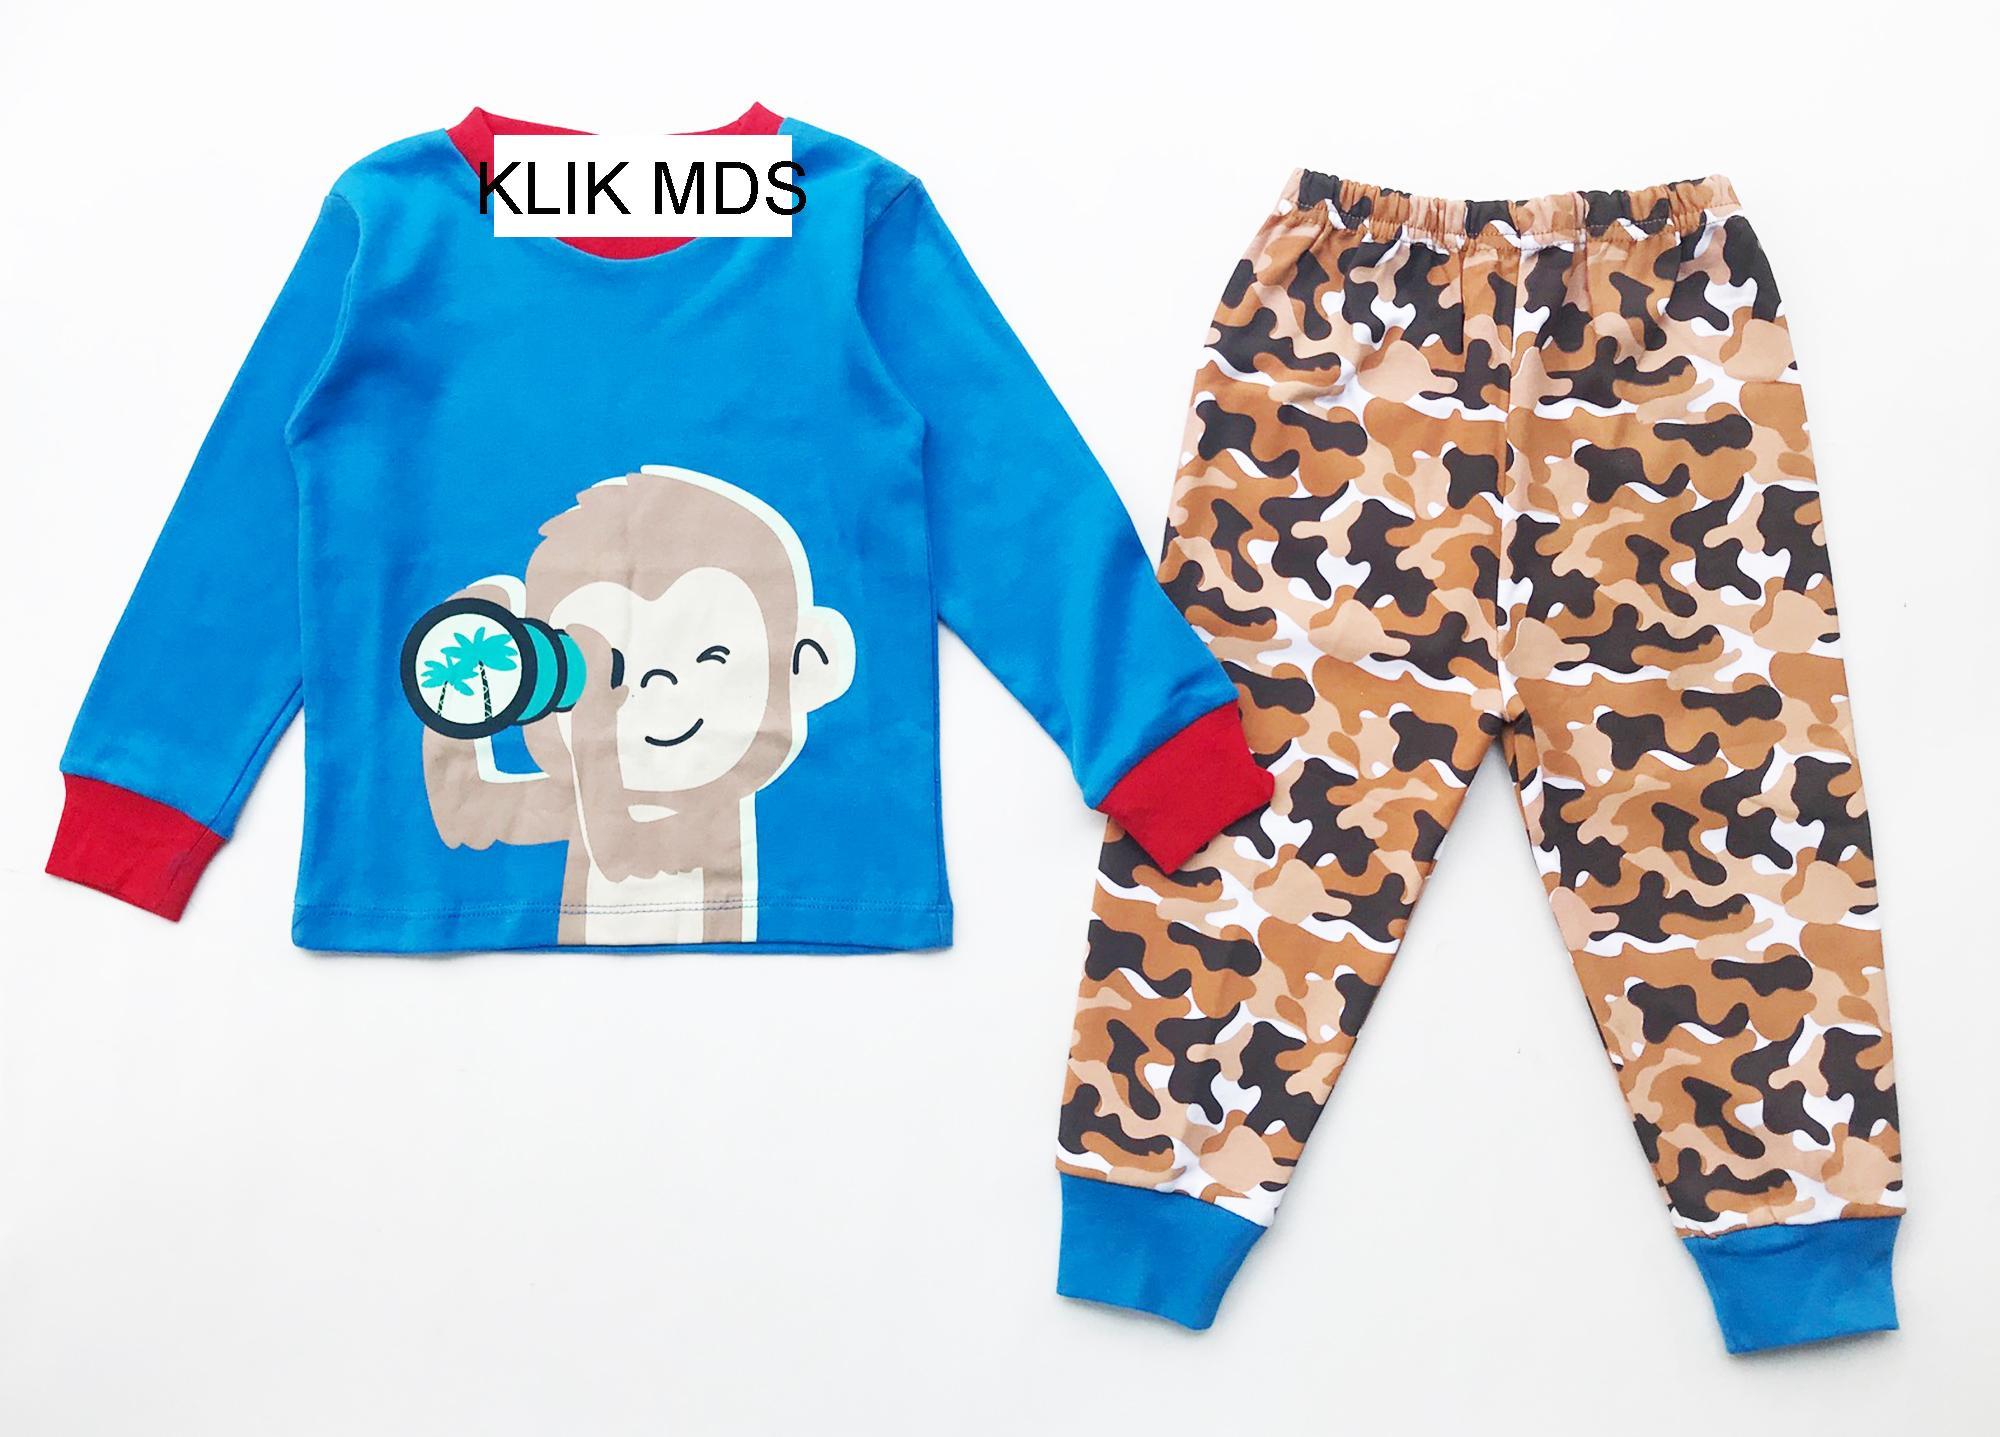 Klik Mds Baju Tidur Anak Laki-Laki Motif Monyet Teropong Tangan Panjang Celana Panjang By Klik Mds.